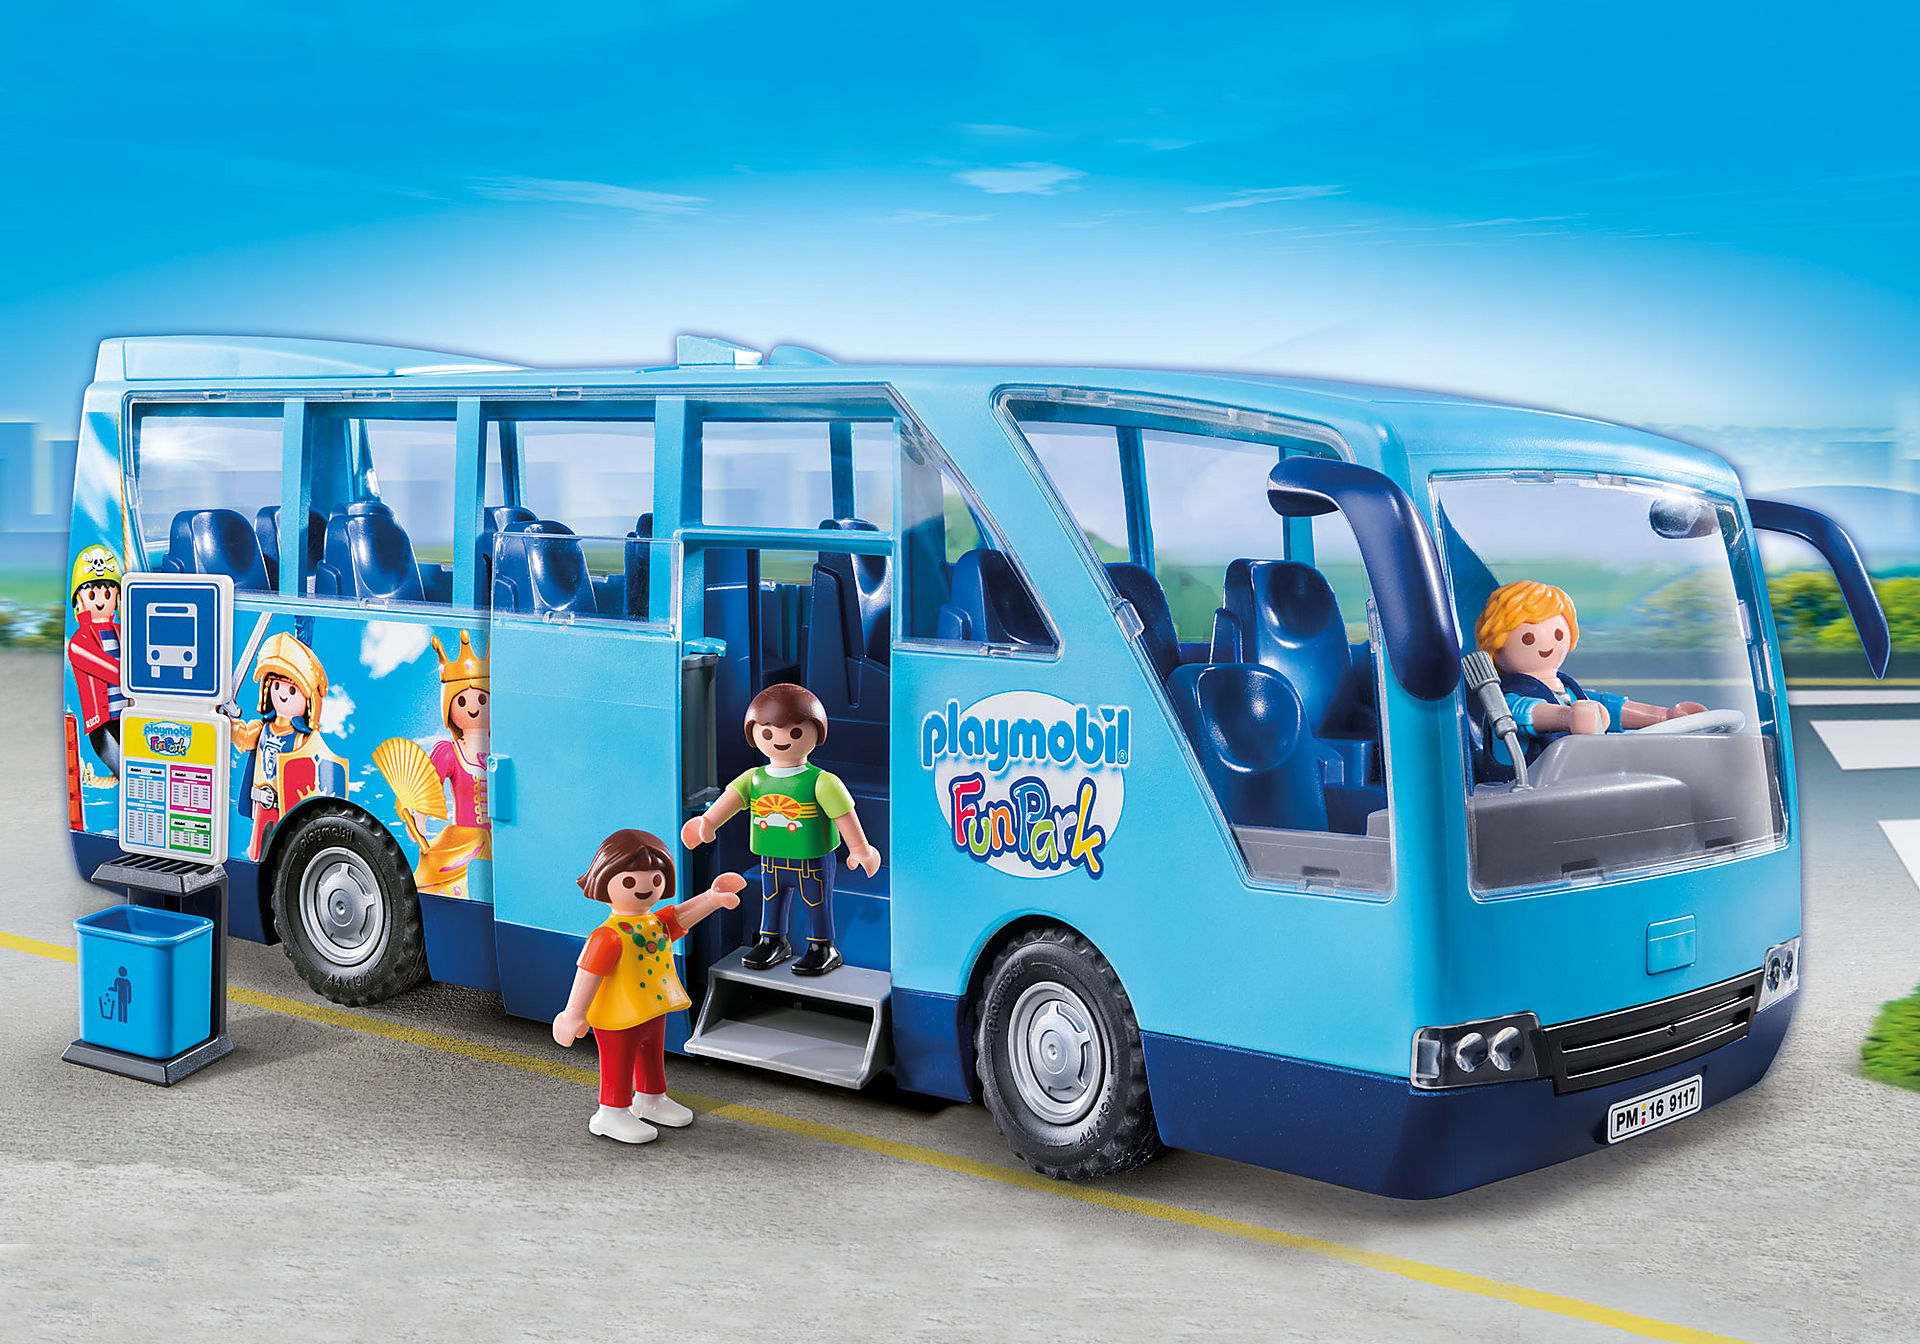 9117 PLAYMOBIL-FunPark Autobús Escolar zoom image1